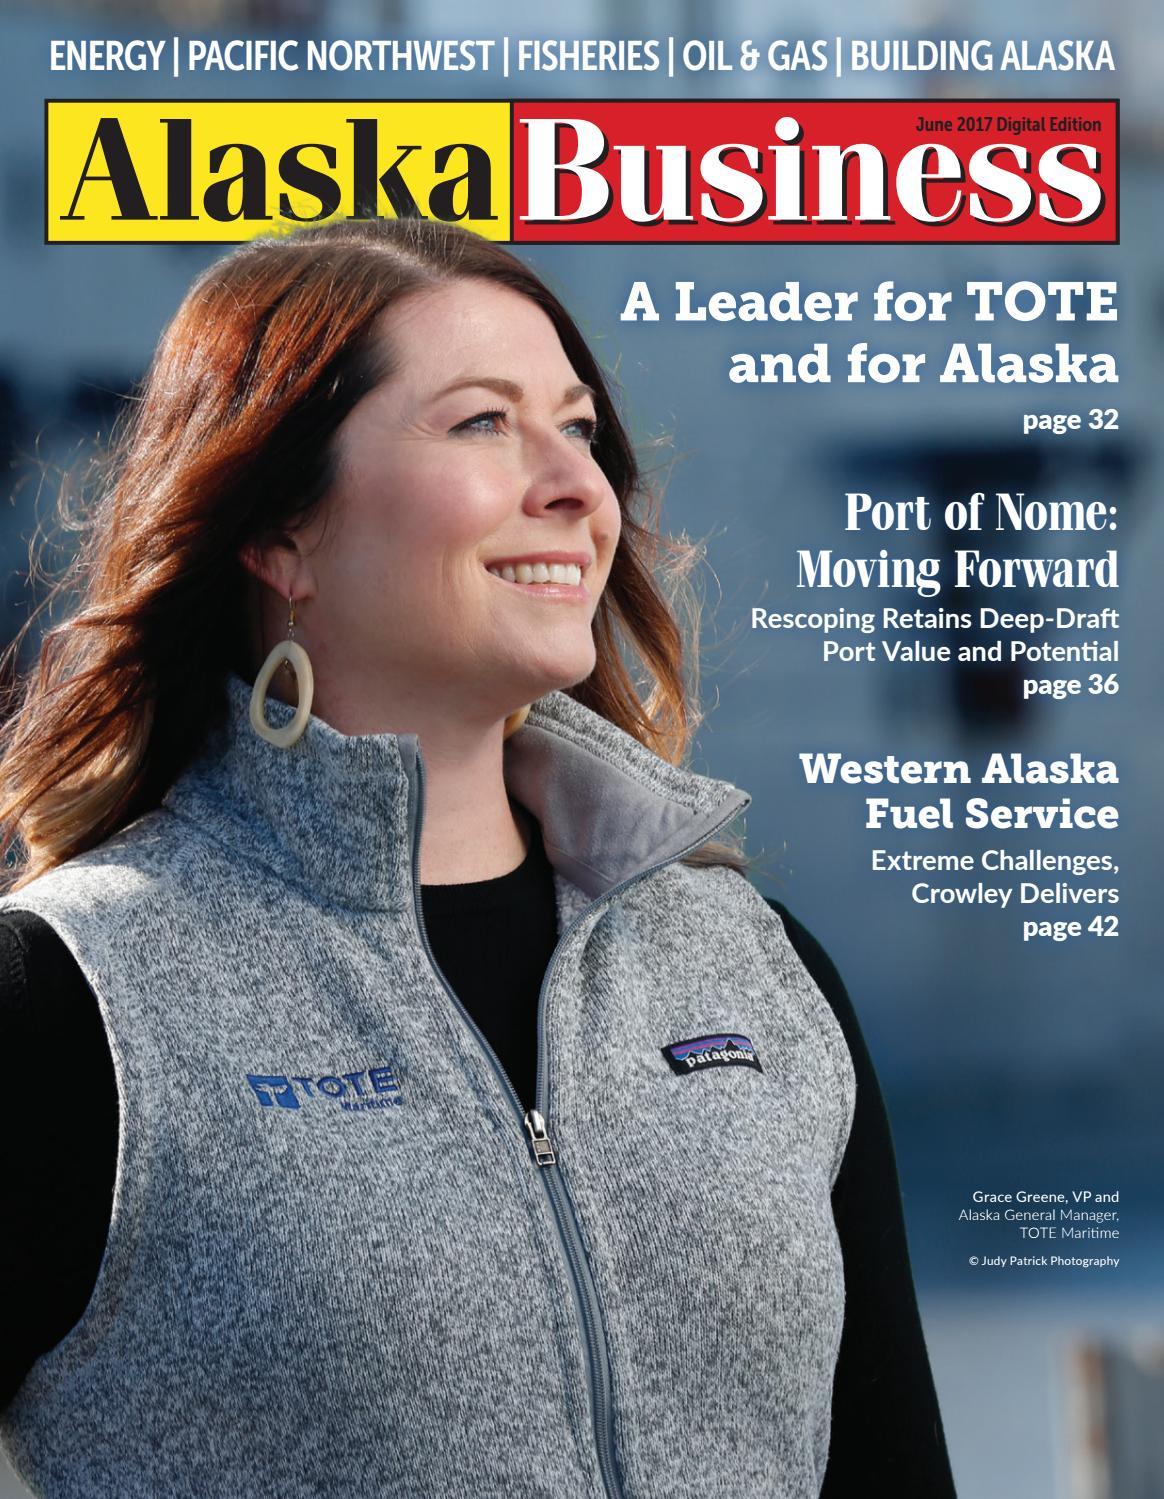 Alaska Business June 2017 by Alaska Business - issuu